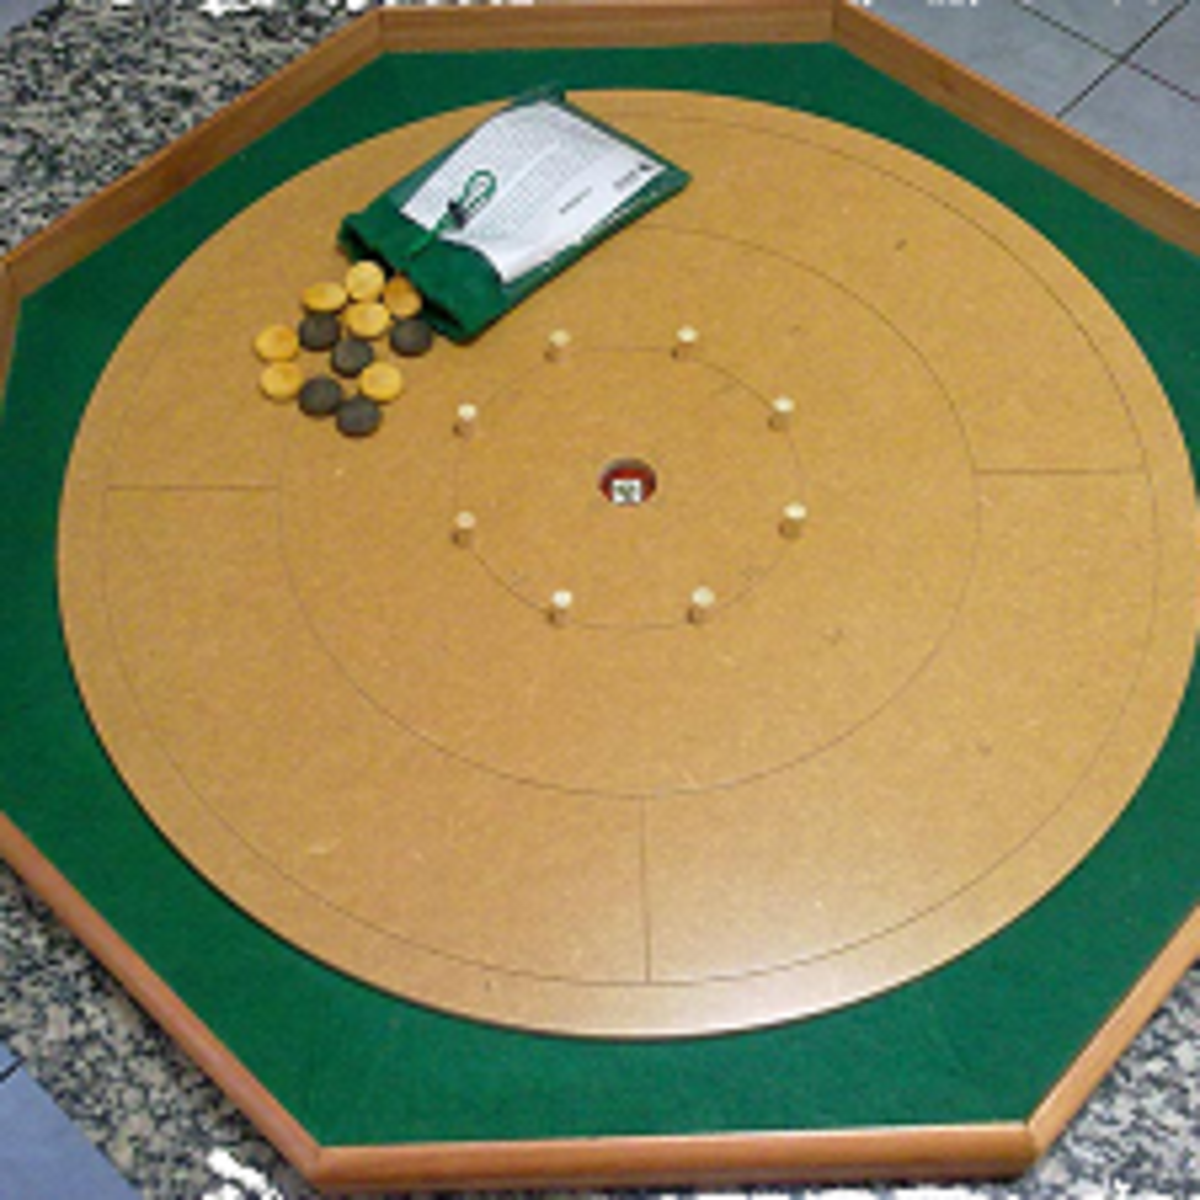 New crokinole board